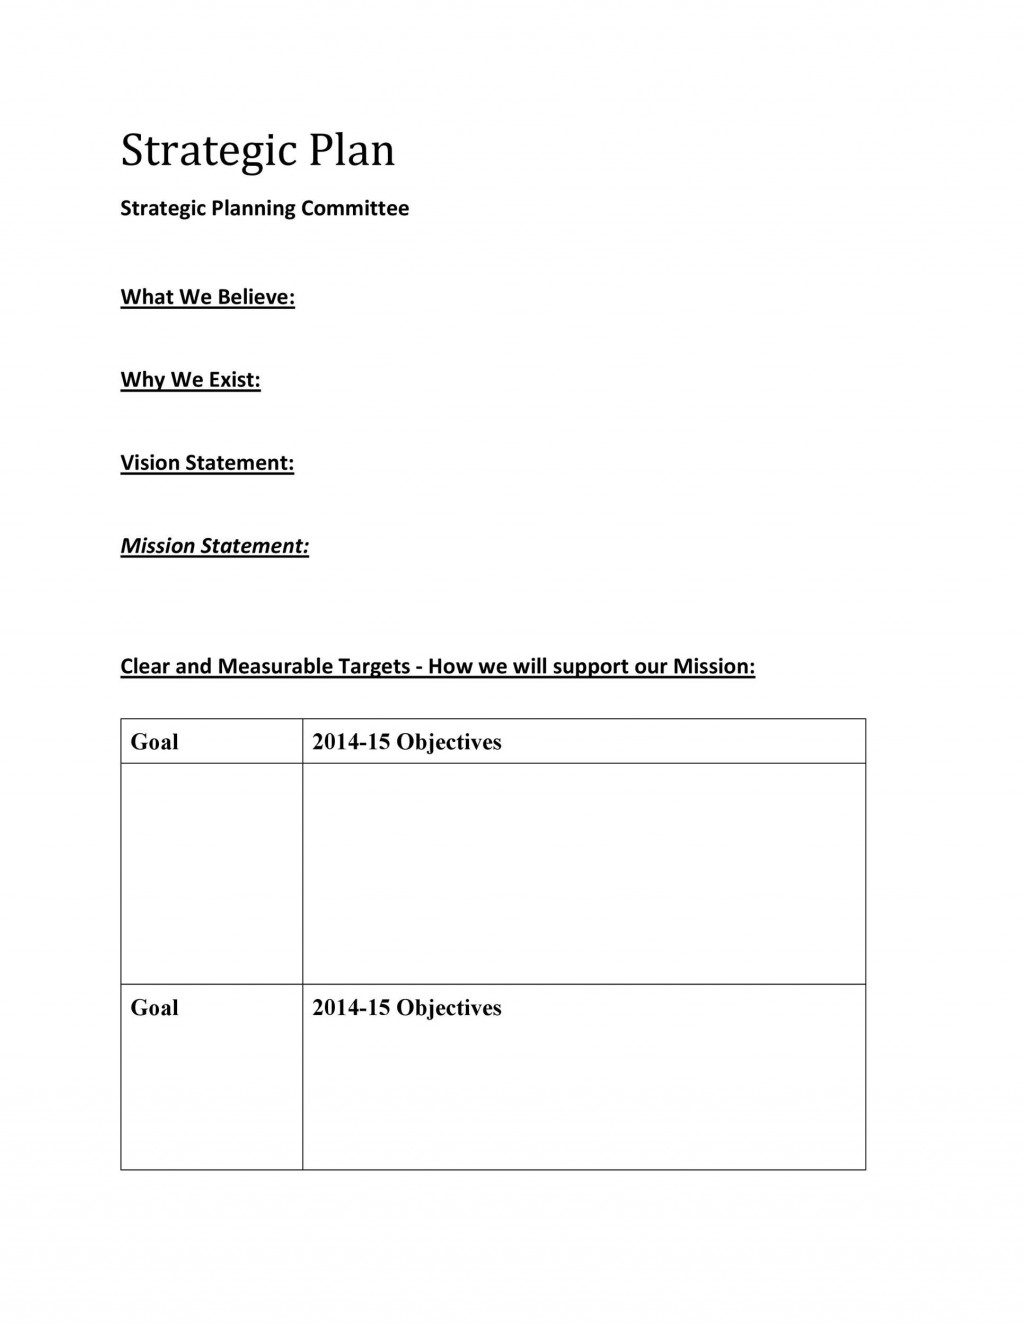 009 Breathtaking Strategic Plan Word Template High Resolution  Document Microsoft MarketingLarge